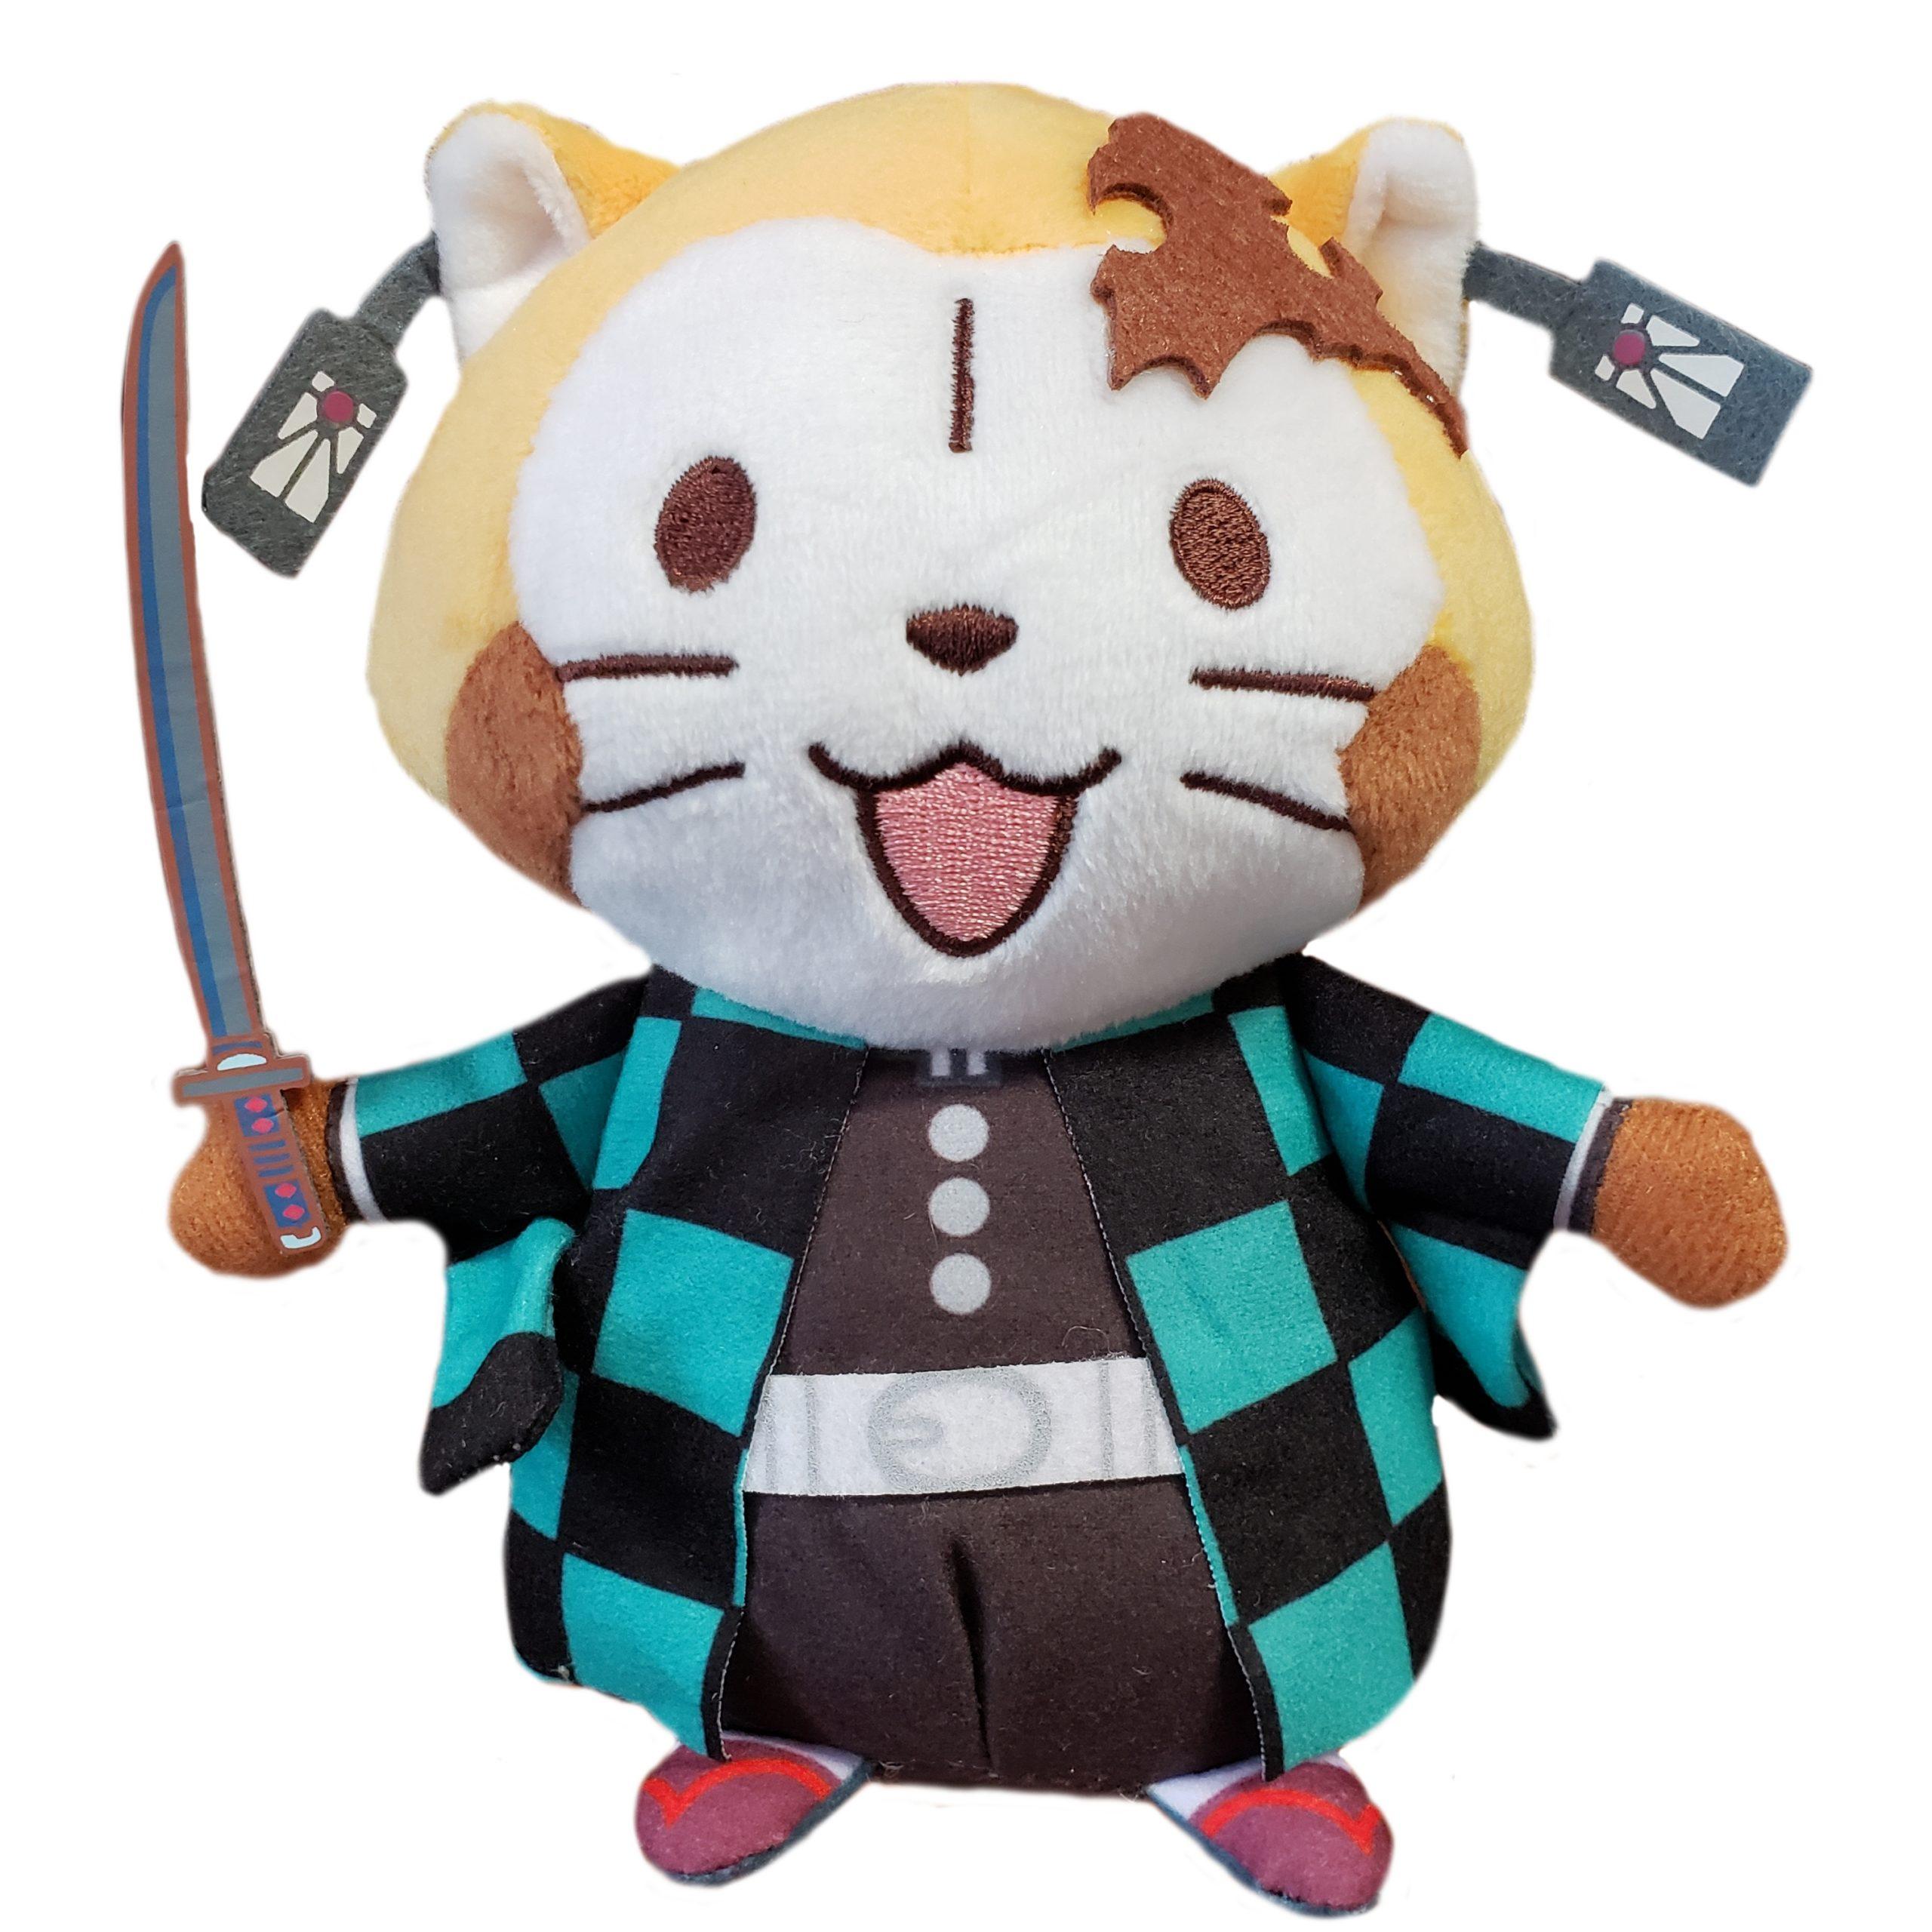 tanjiro-demon-slayer-x-rascal-plush (1)